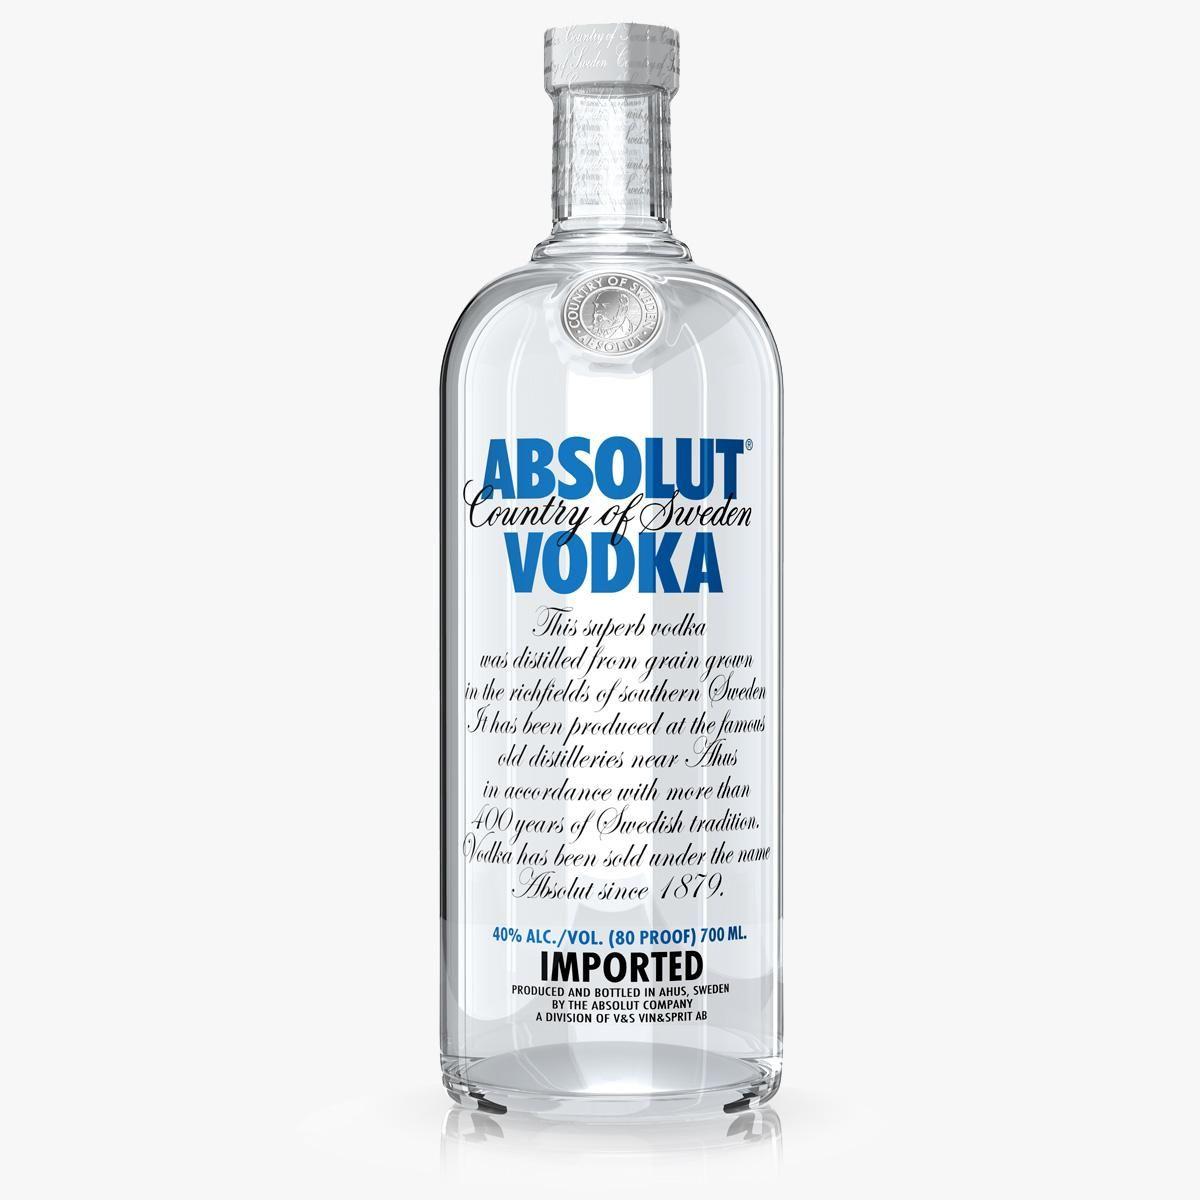 Absolut Vodka 3D Model #AD ,#Absolut#Vodka#Model